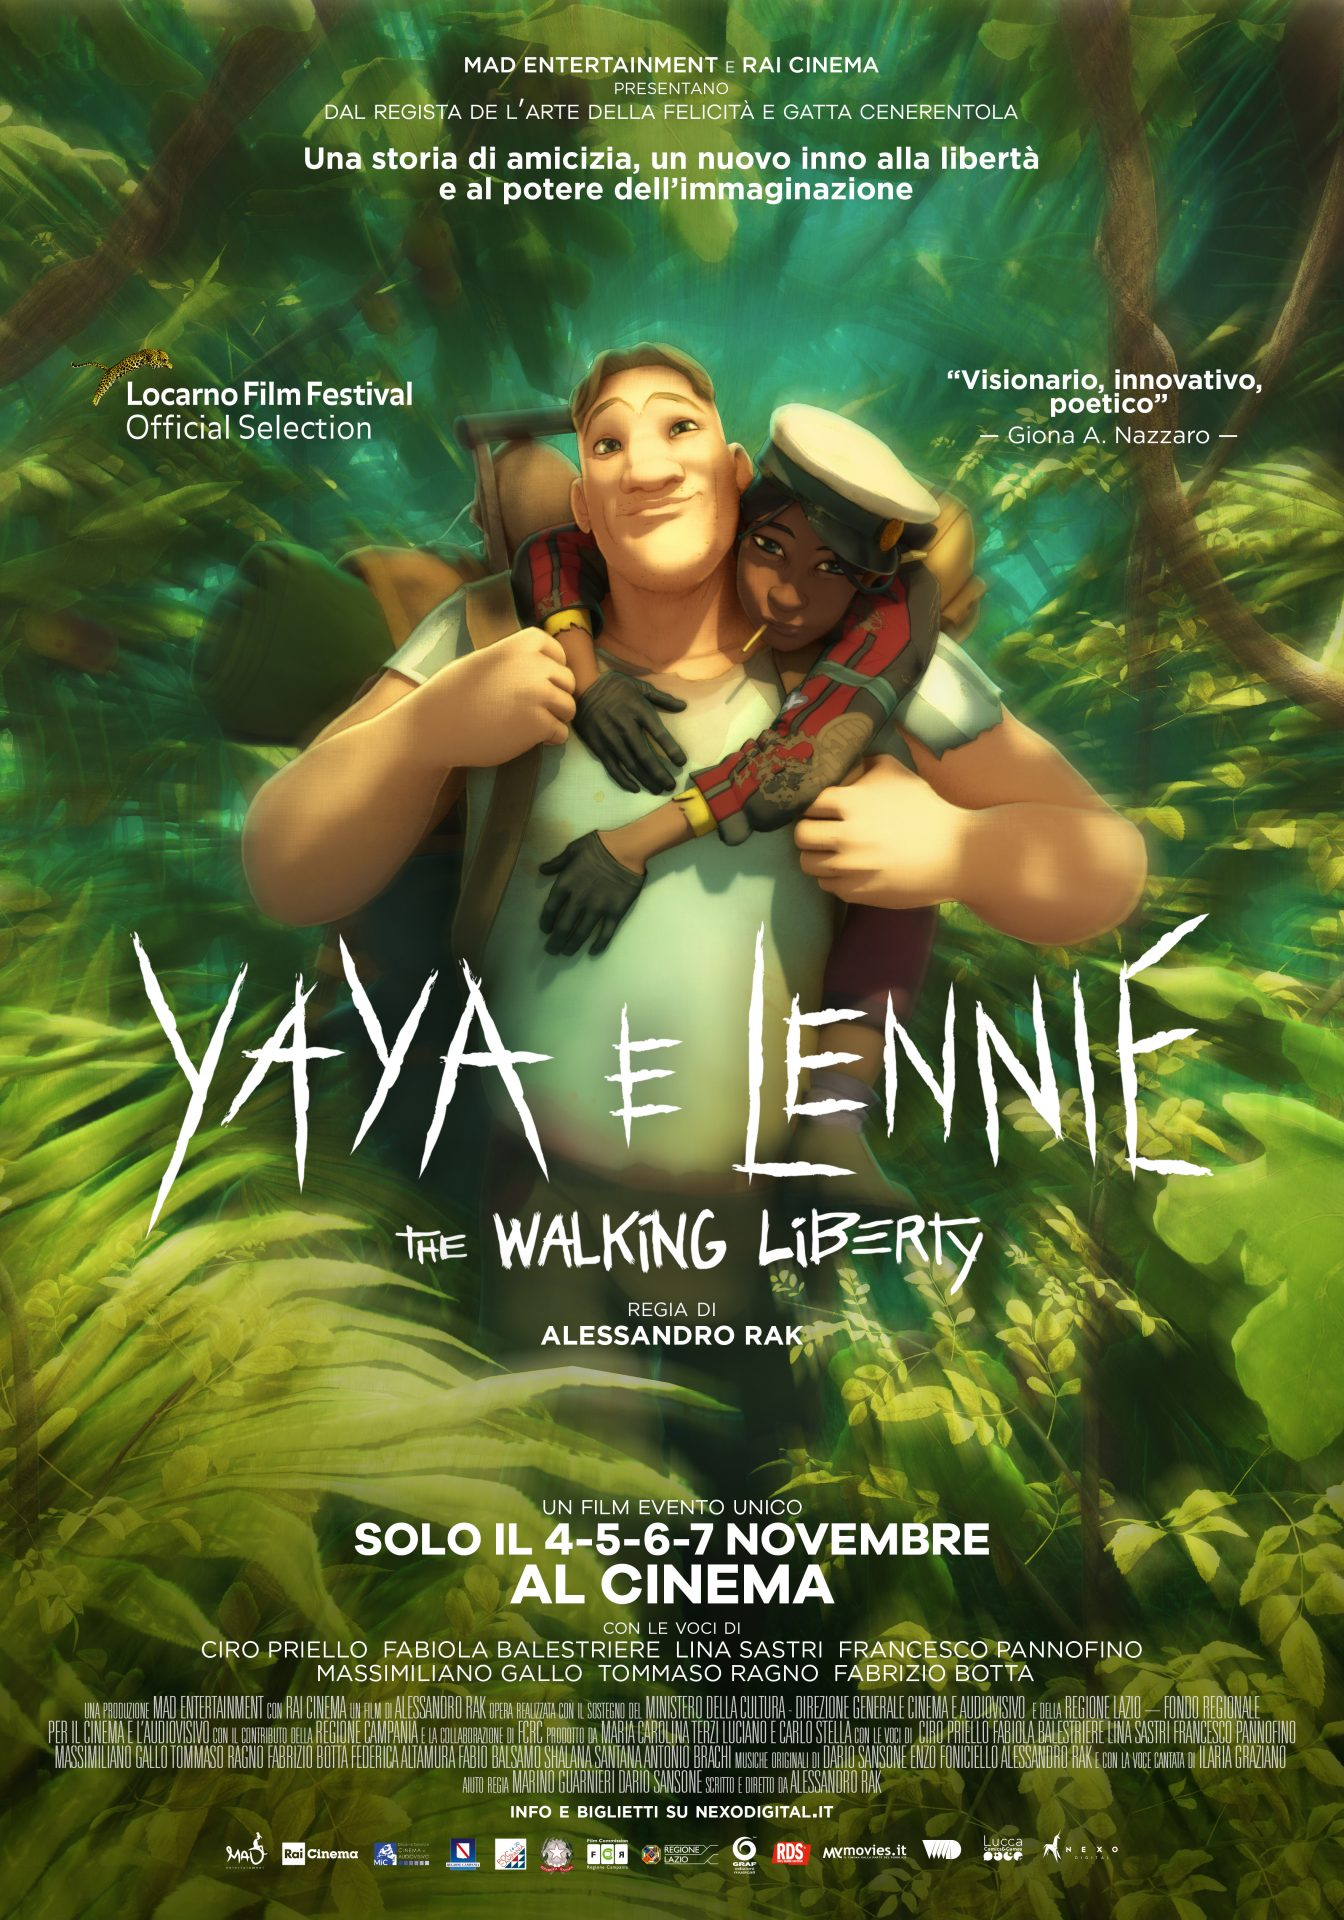 Yaya e Lennie – The Walking Liberty